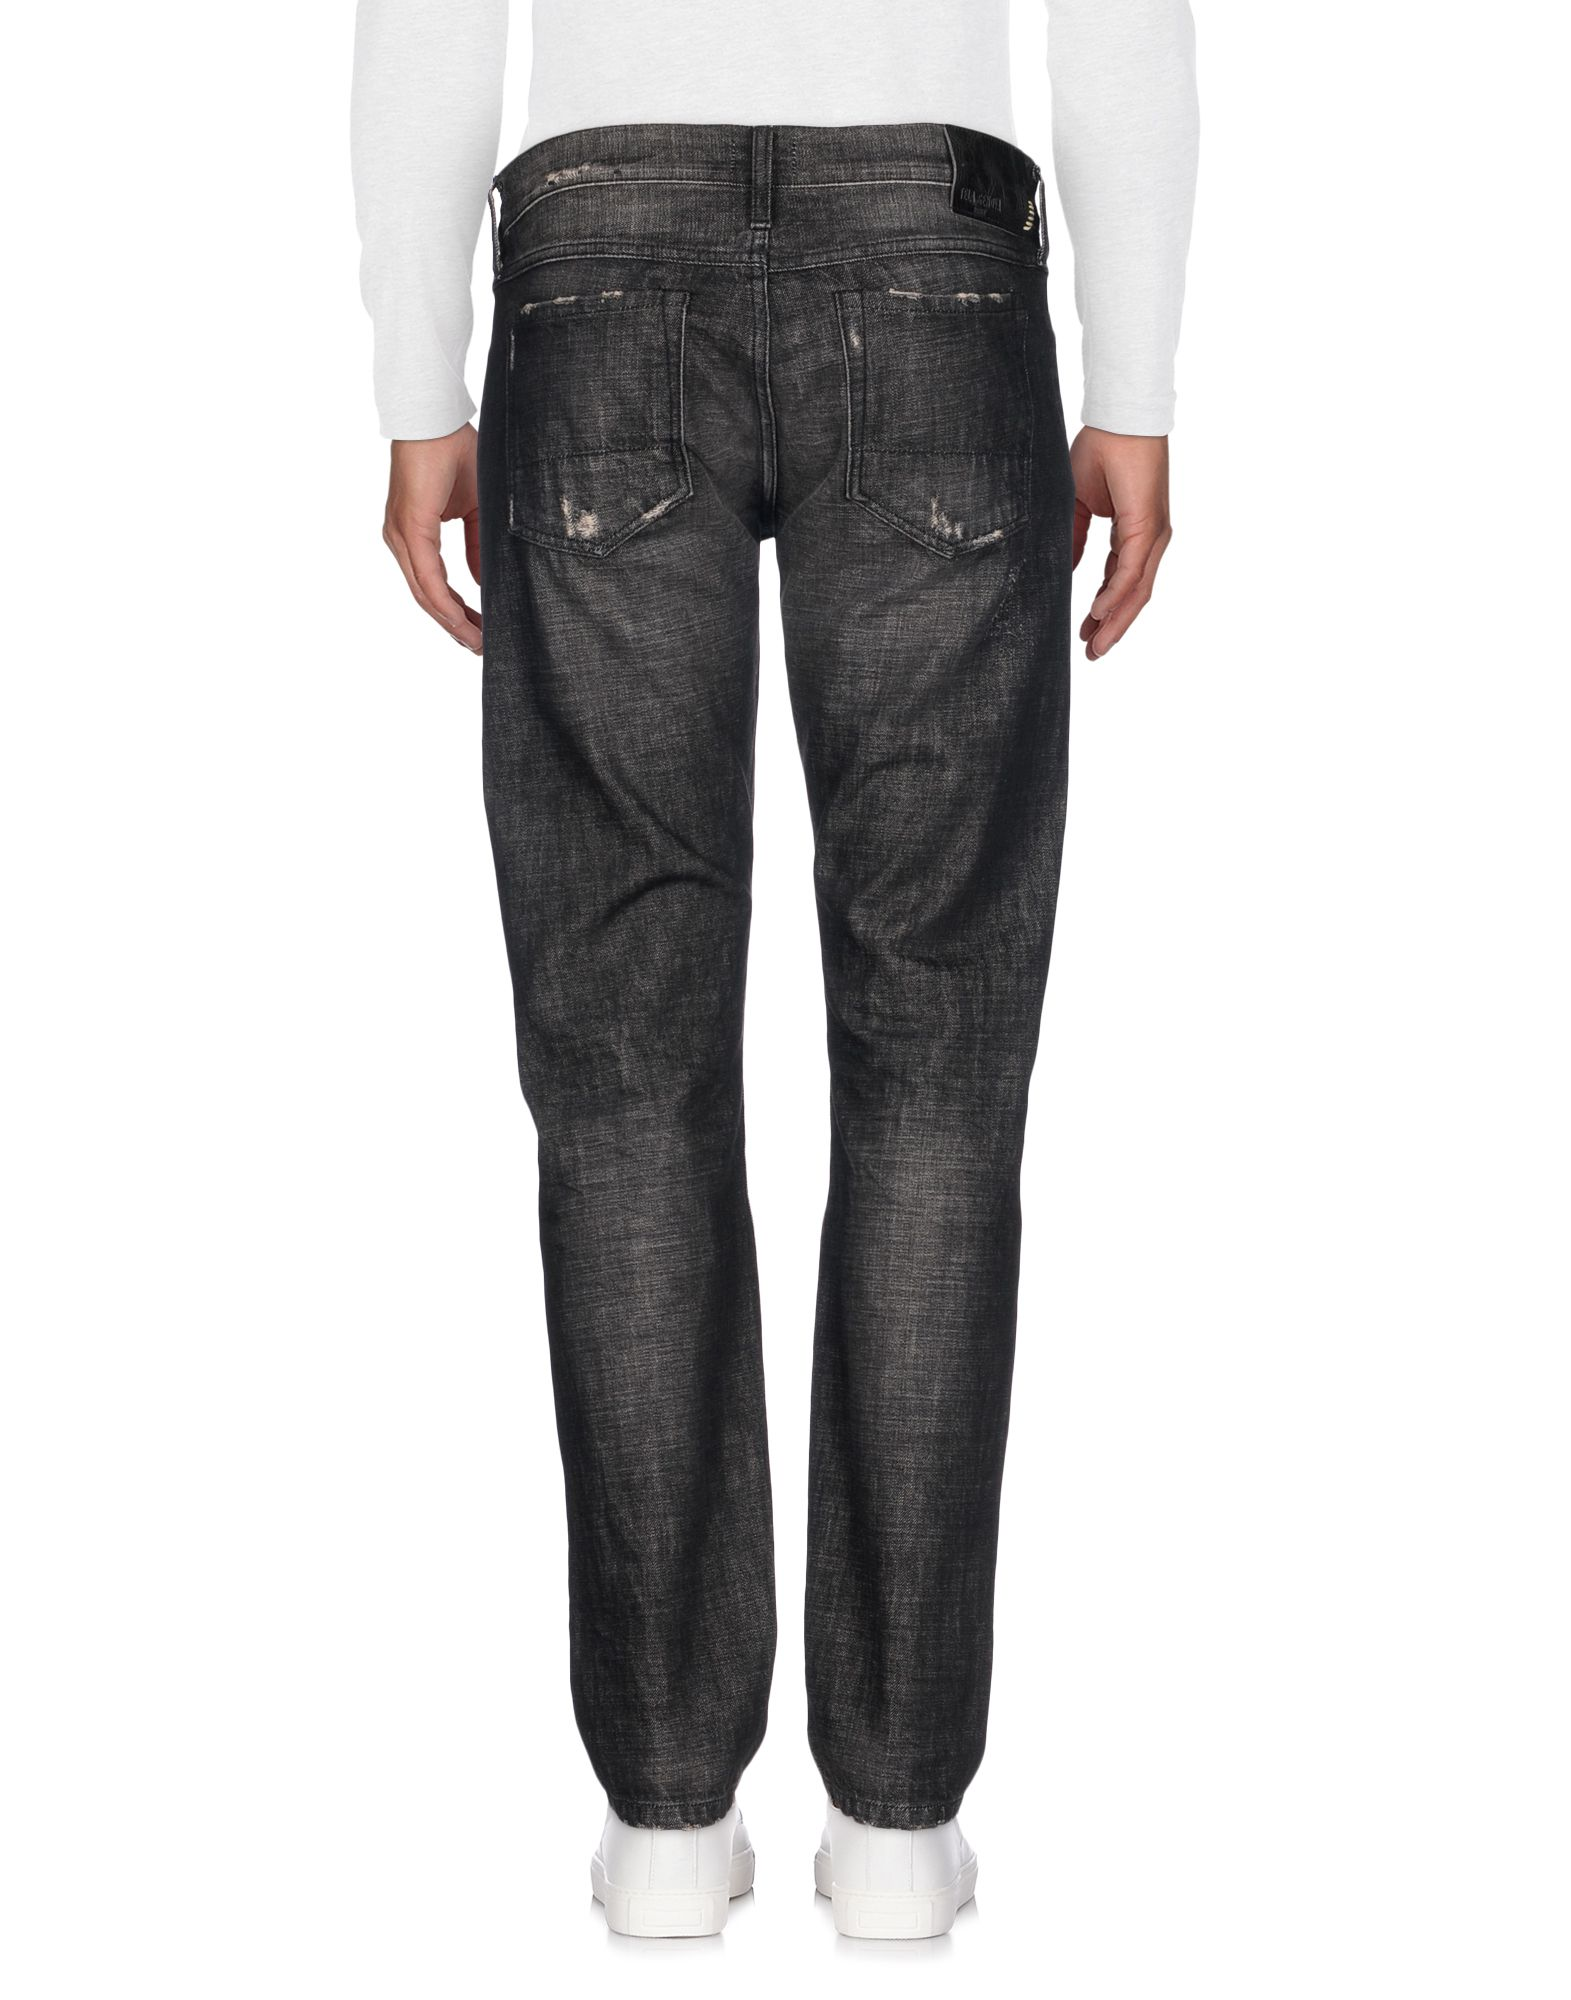 Pantaloni Jeans Jeans Pantaloni Tela Genova Uomo - 42681306WS ab3b08